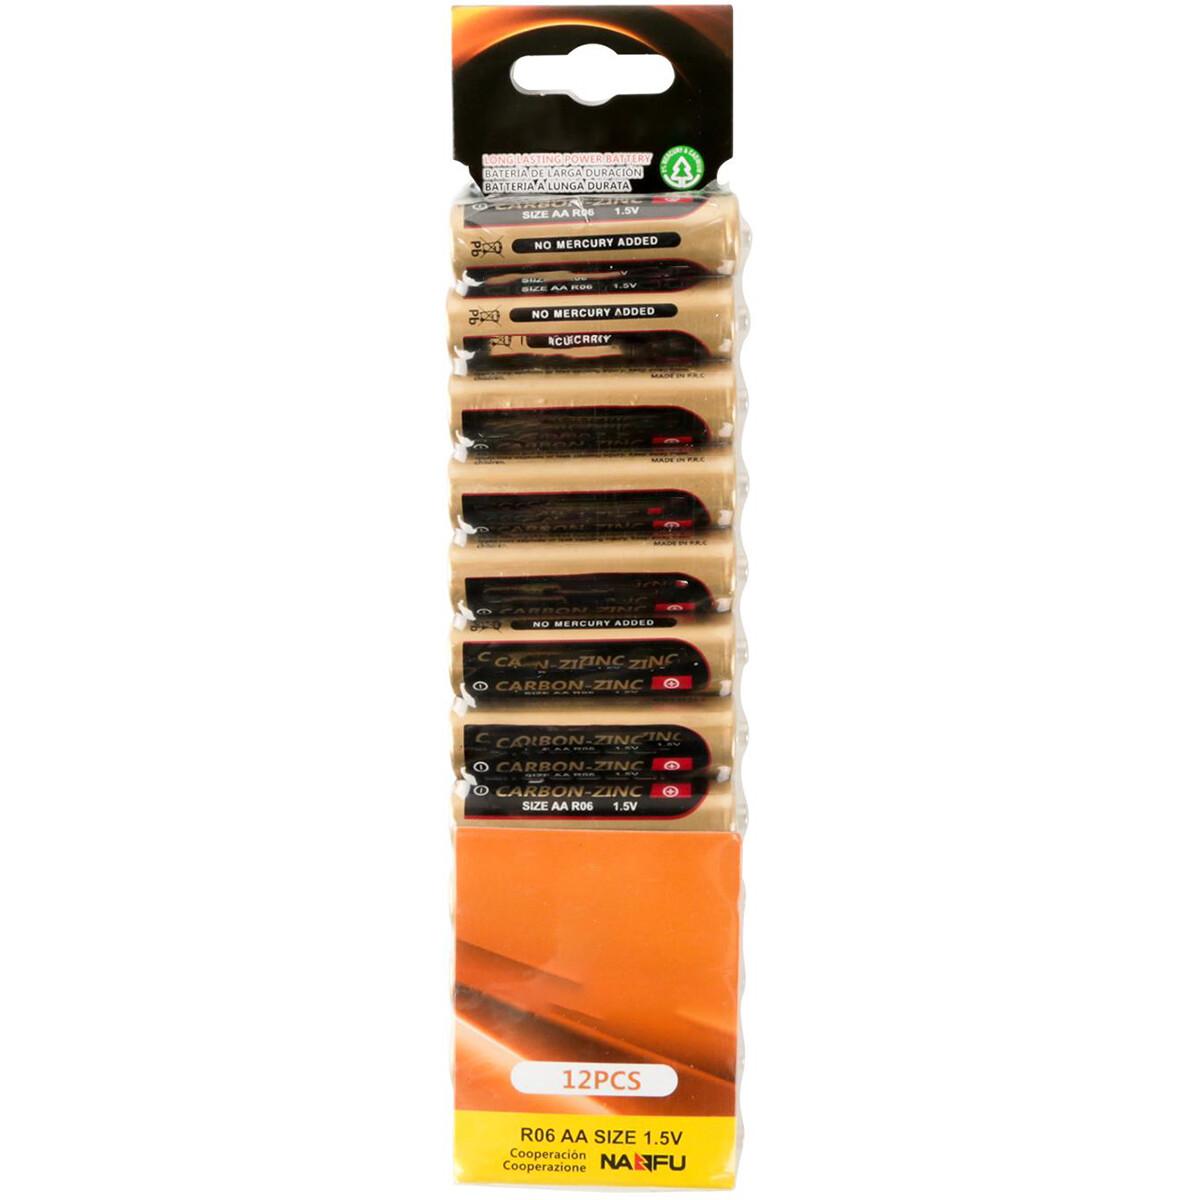 Batterij - Aigi Azo - AA/LR06 - 1.5V - Alkaline Batterijen - 12 Stuks